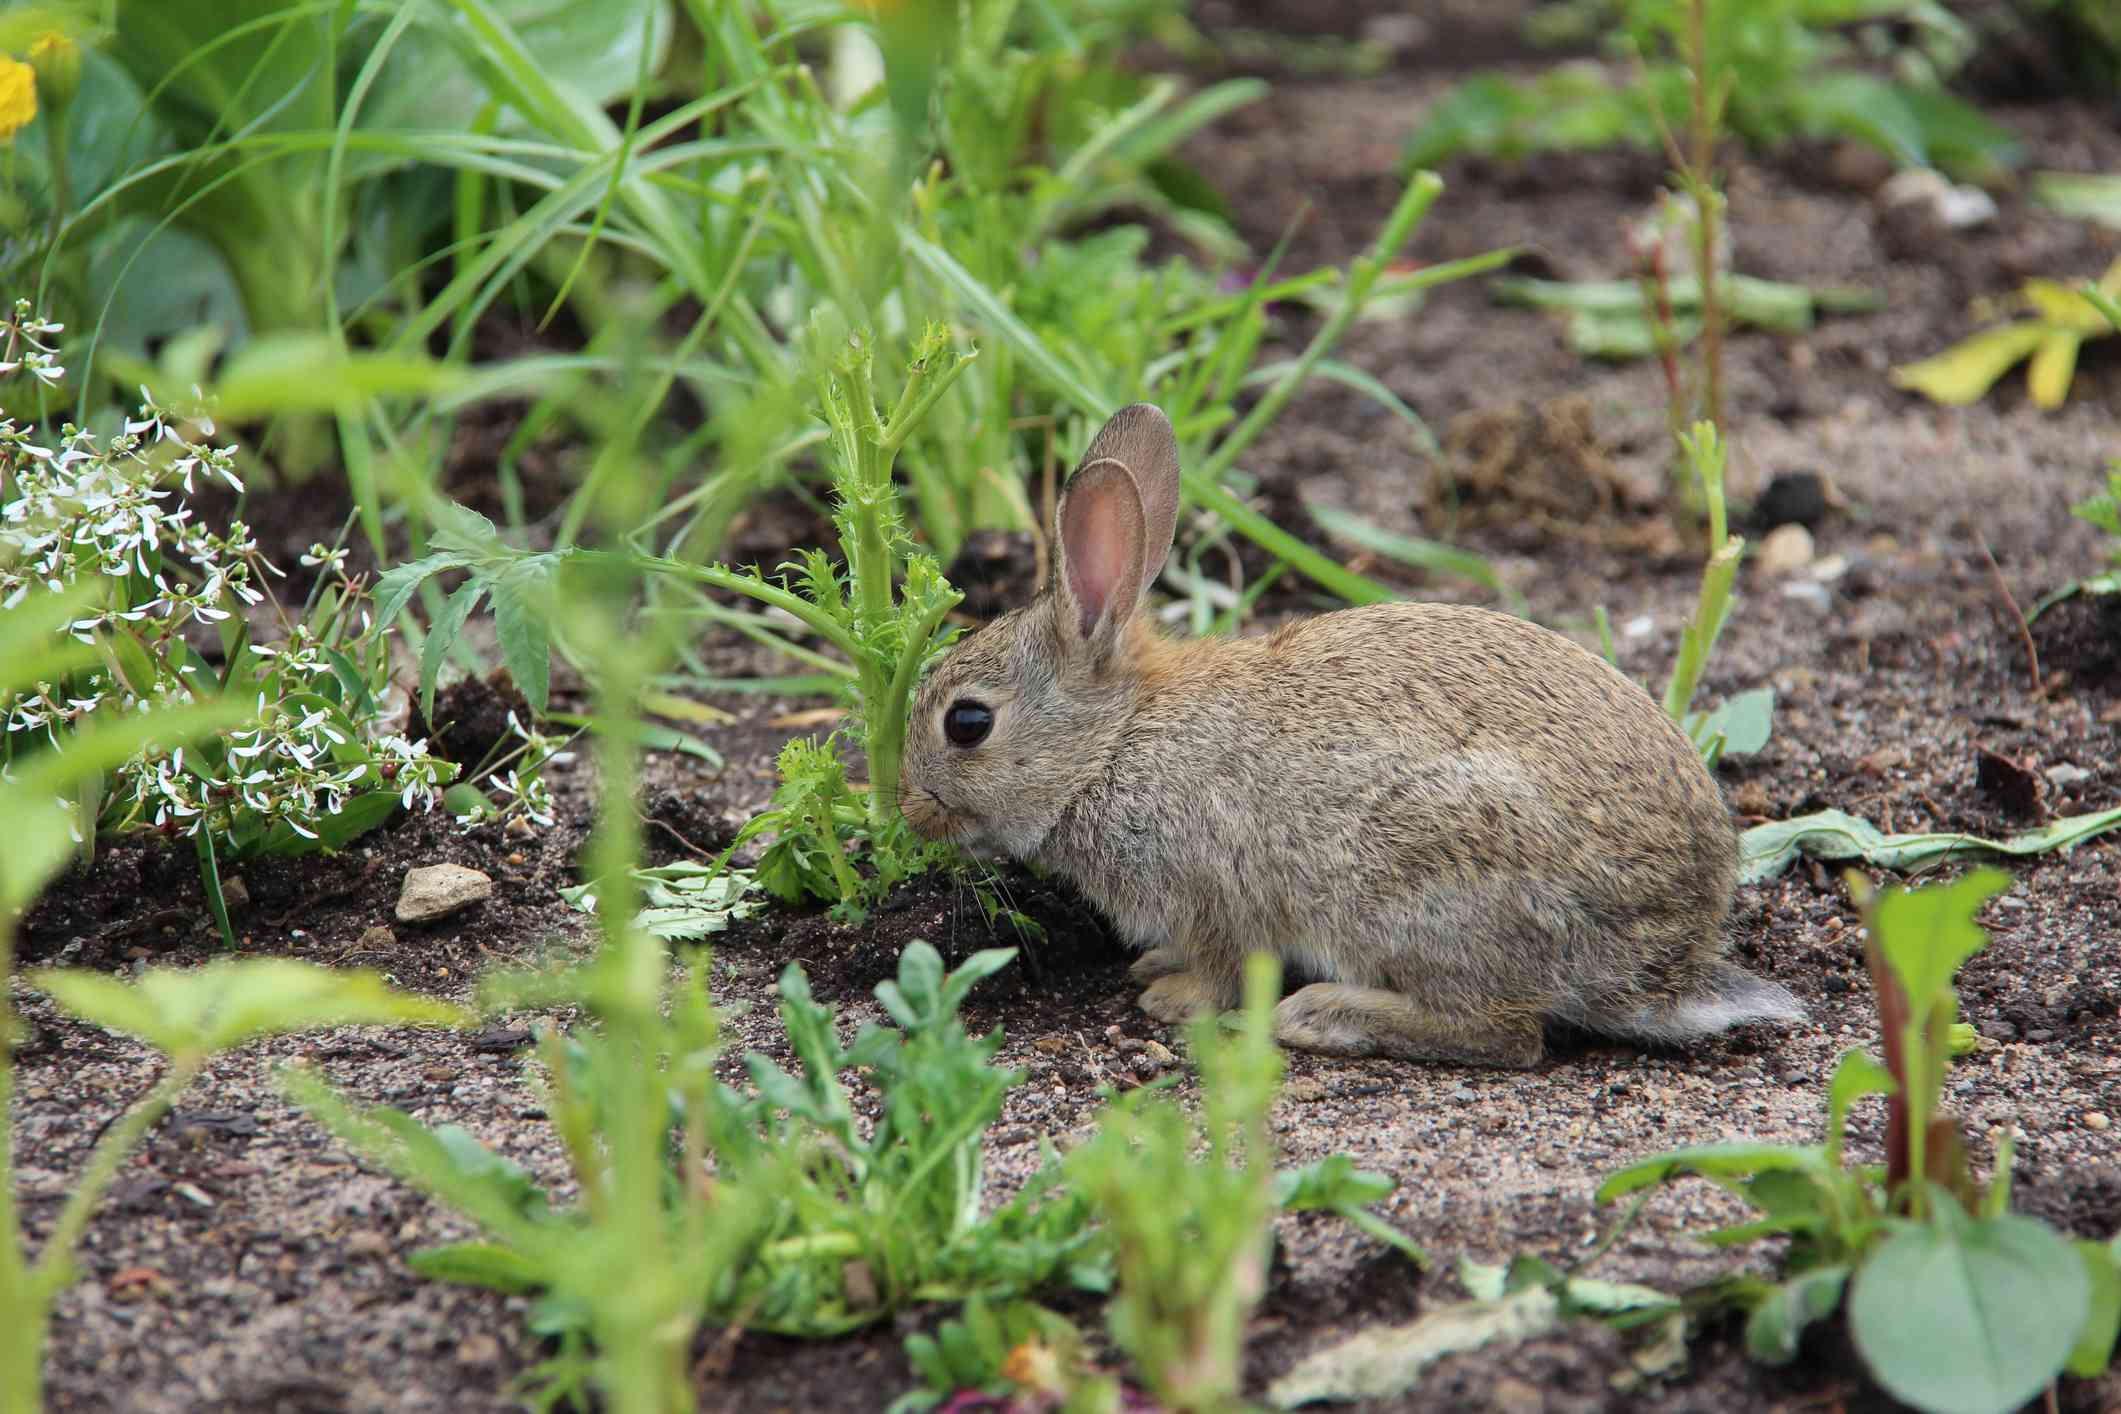 Brown rabbit in a vegetable garden